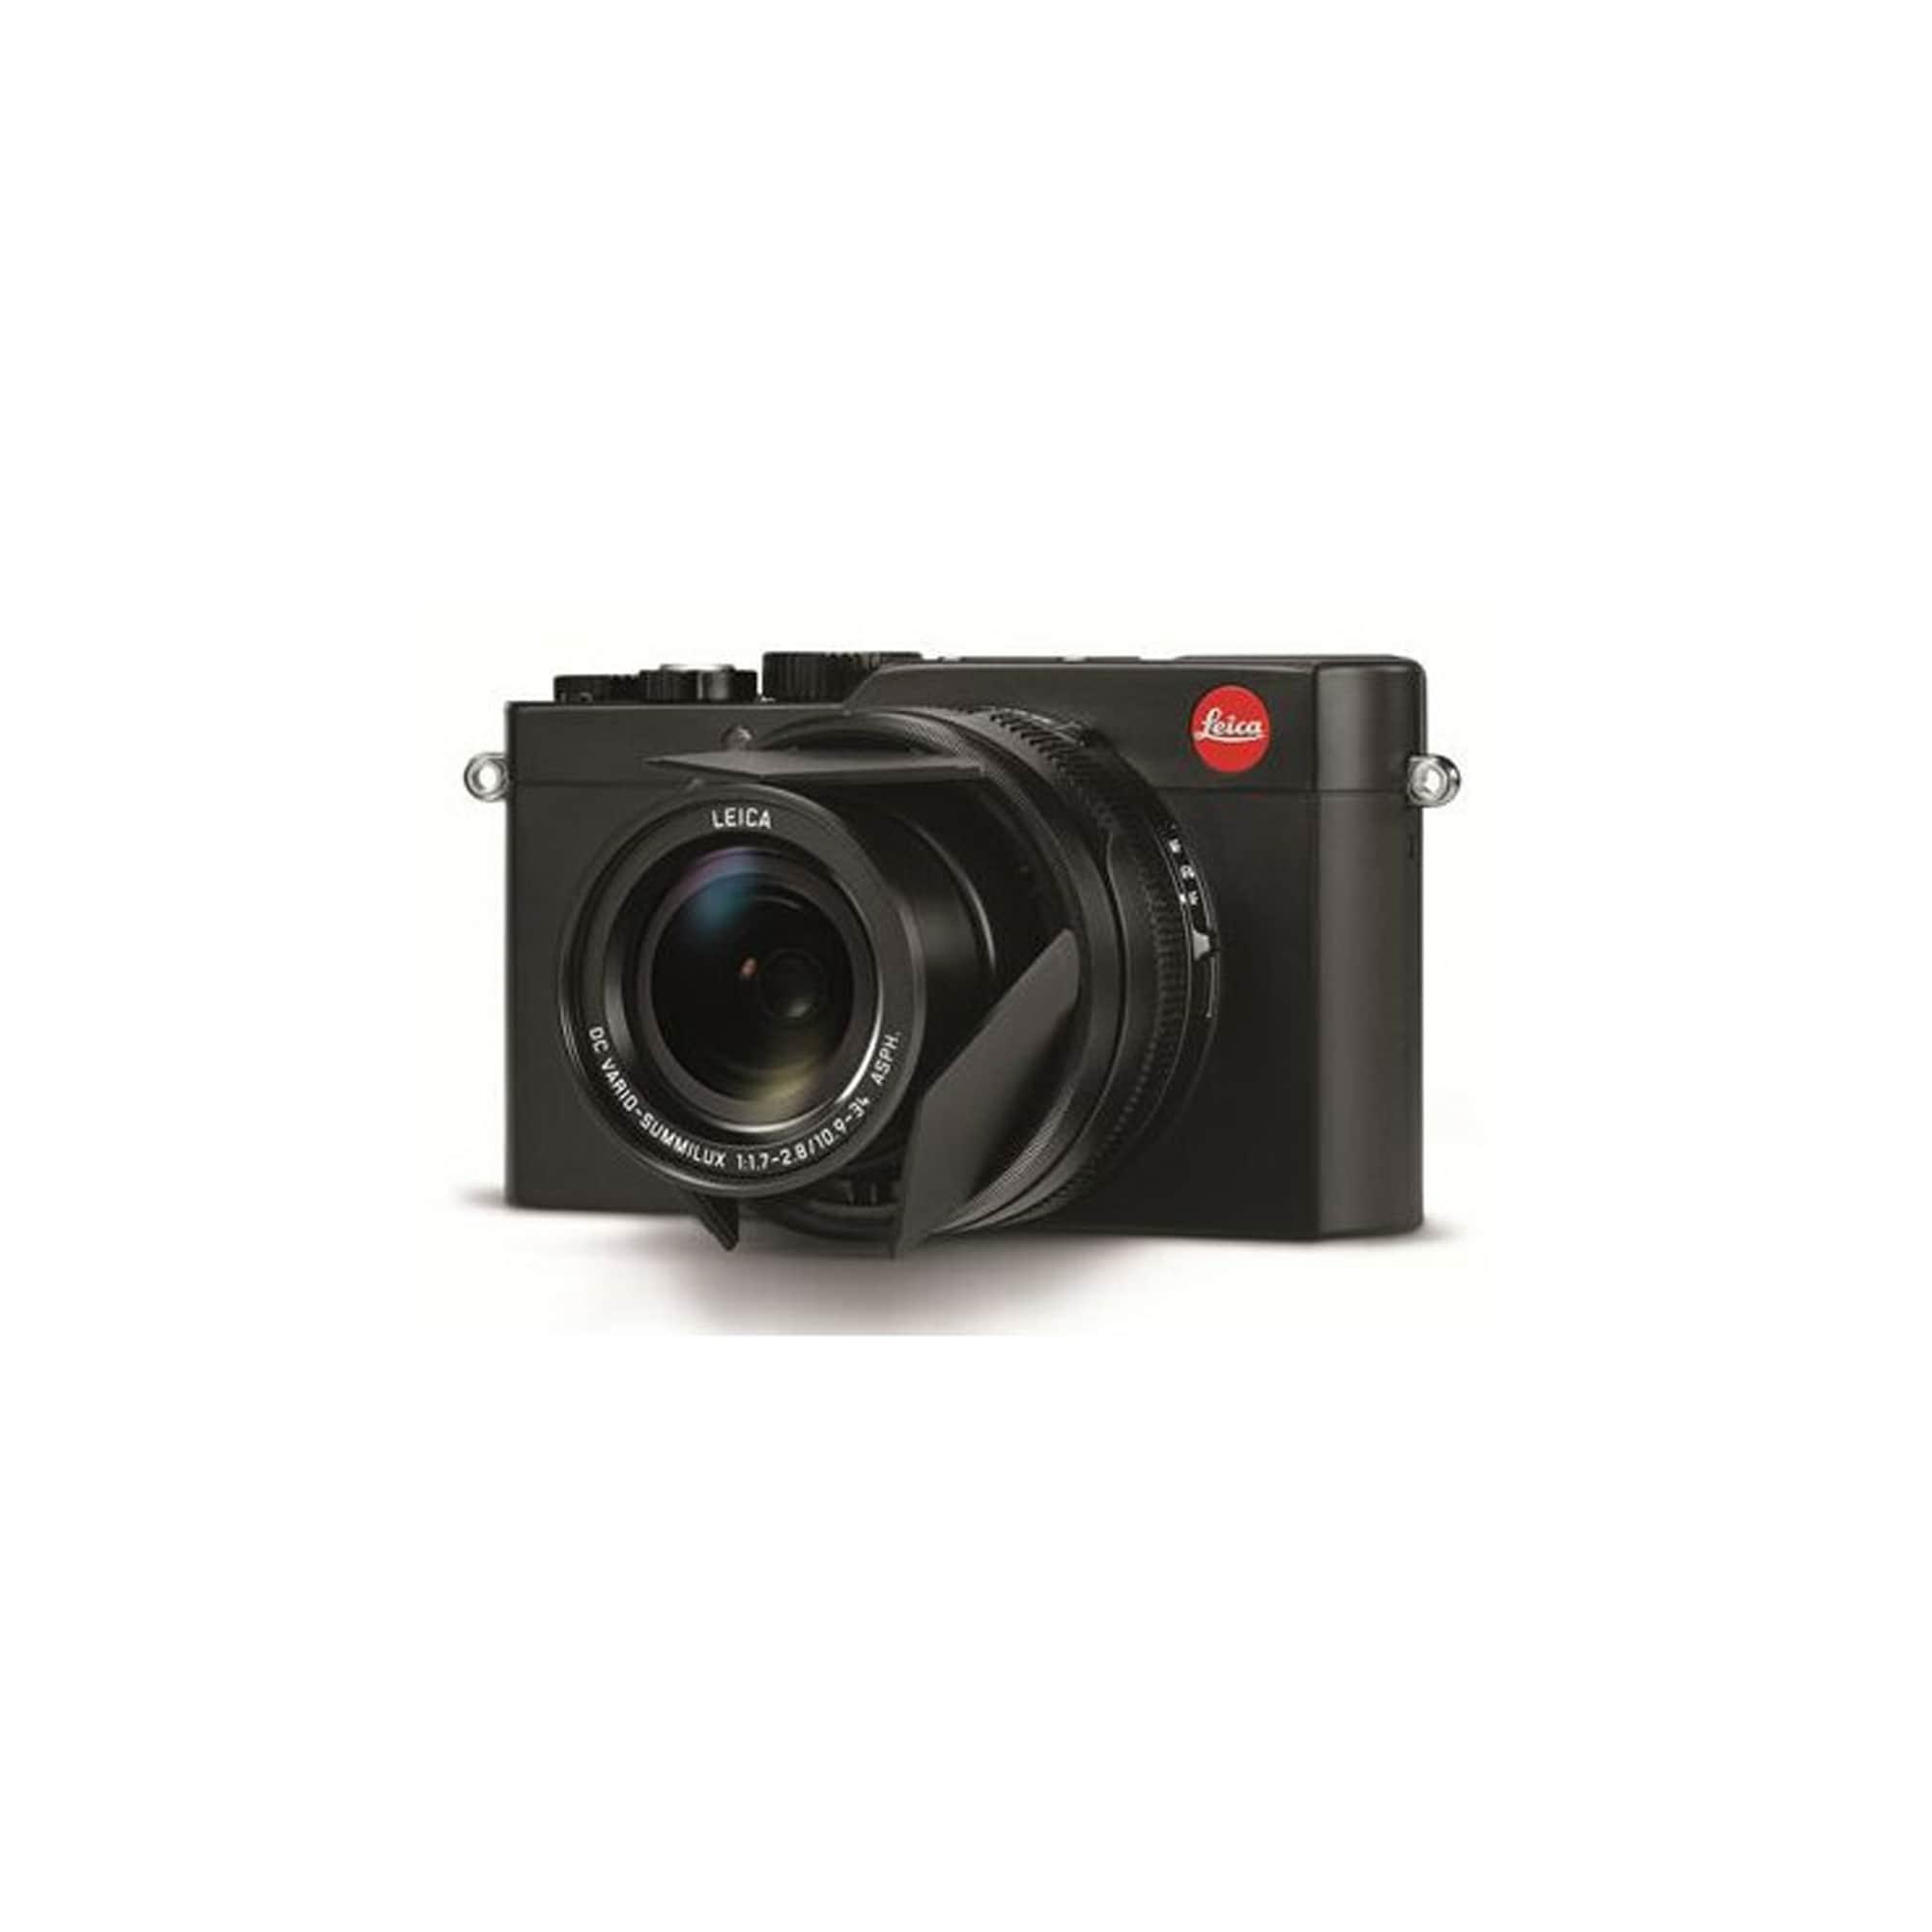 Leica Autolock D-LUX